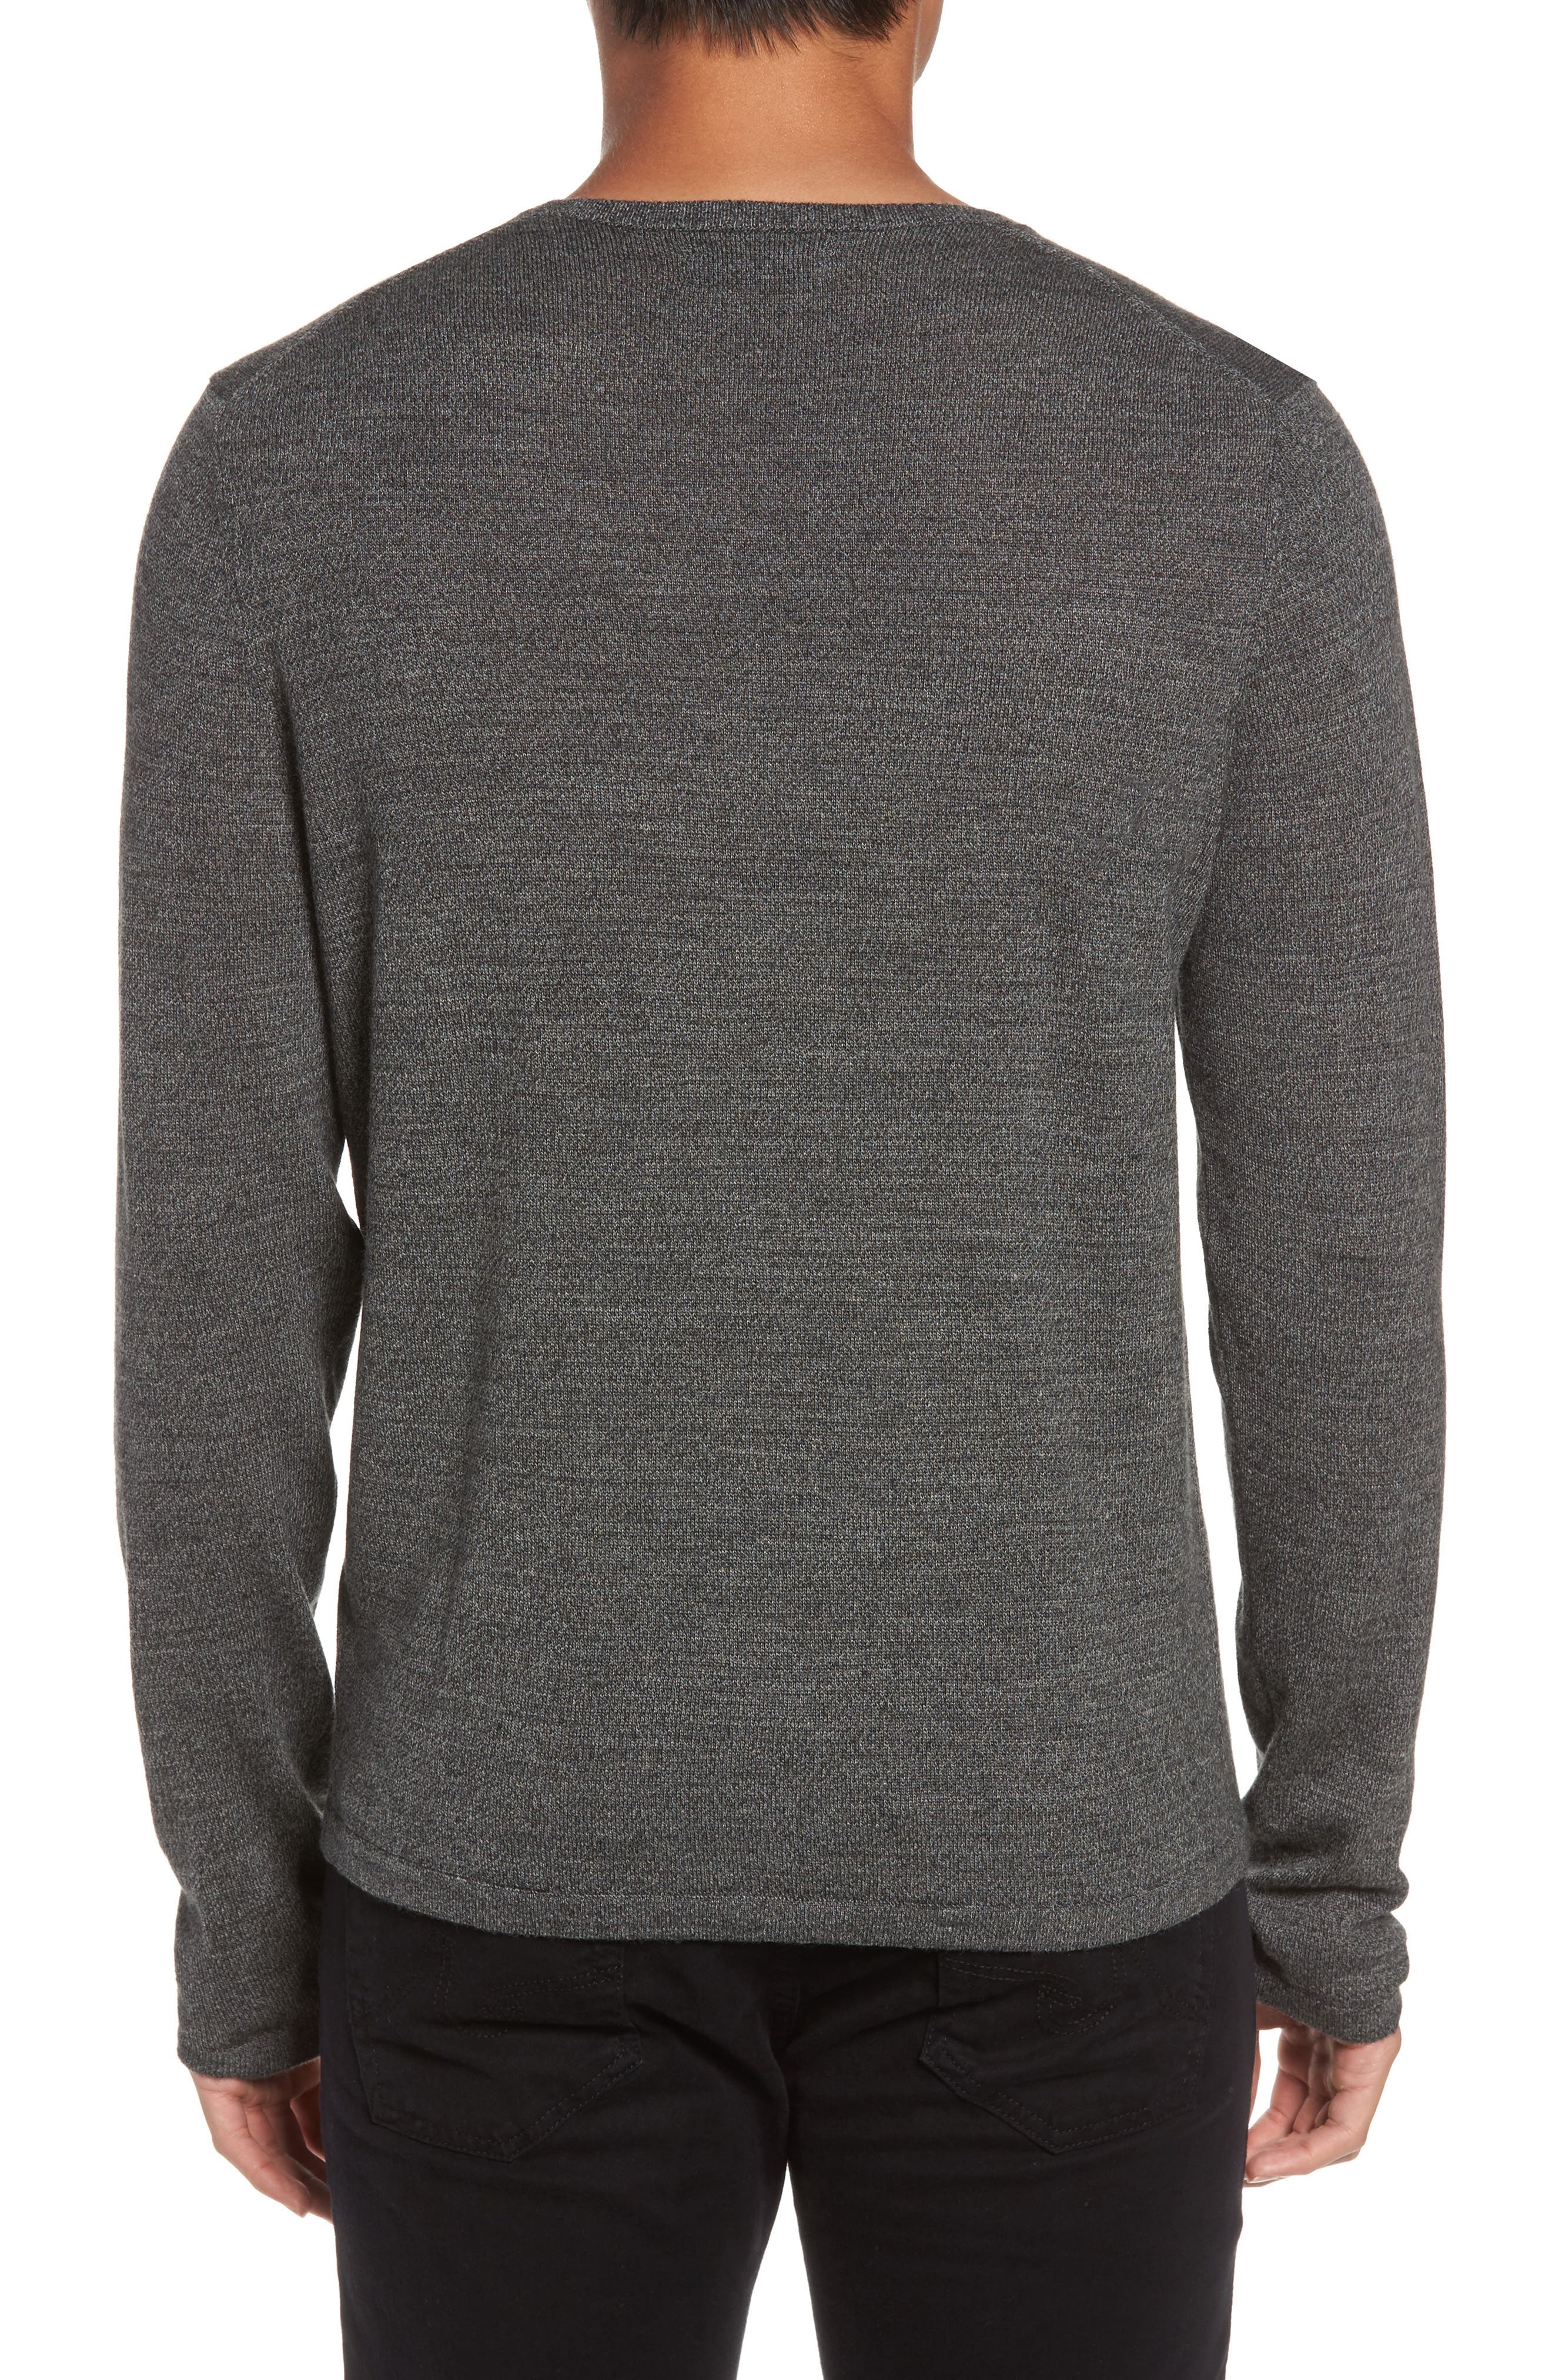 Alternate Image 2  - Calibrate Merino Blend Crewneck Sweater